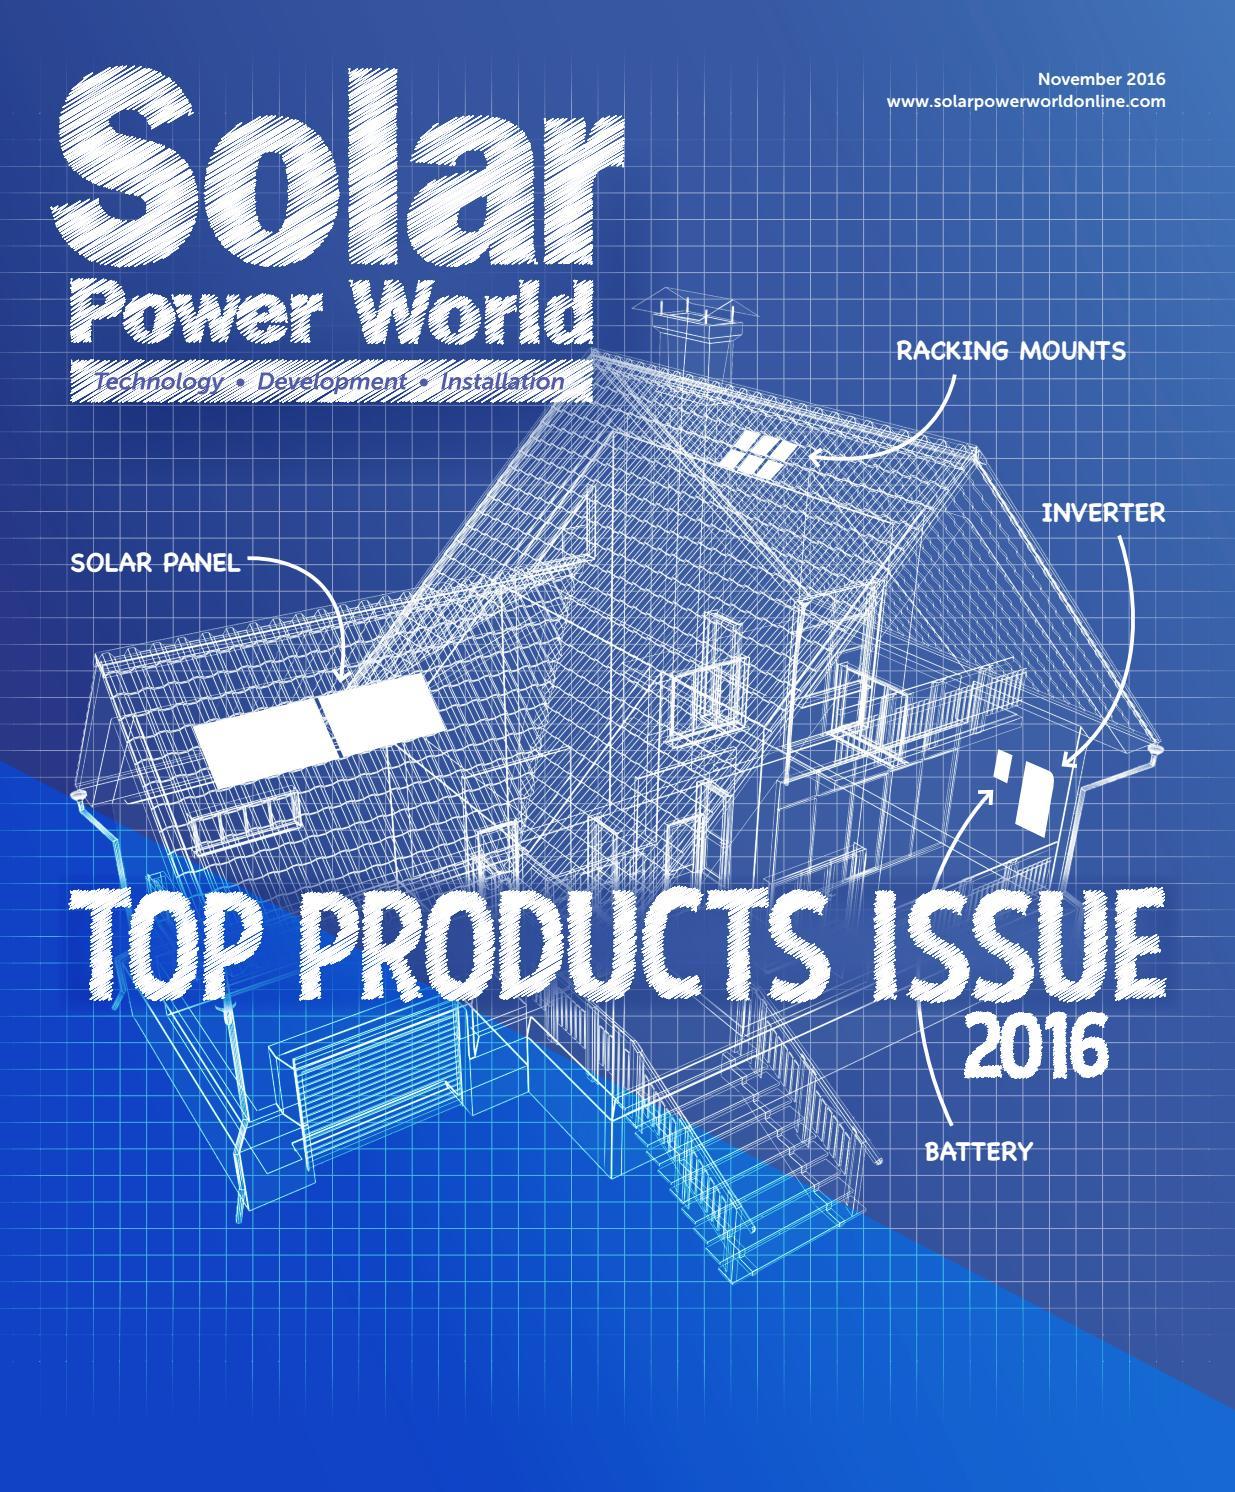 Solar Power World November 2016 By Wtwh Media Llc Issuu Home Telephone Wiring Diagram Likewise Diy Panel System